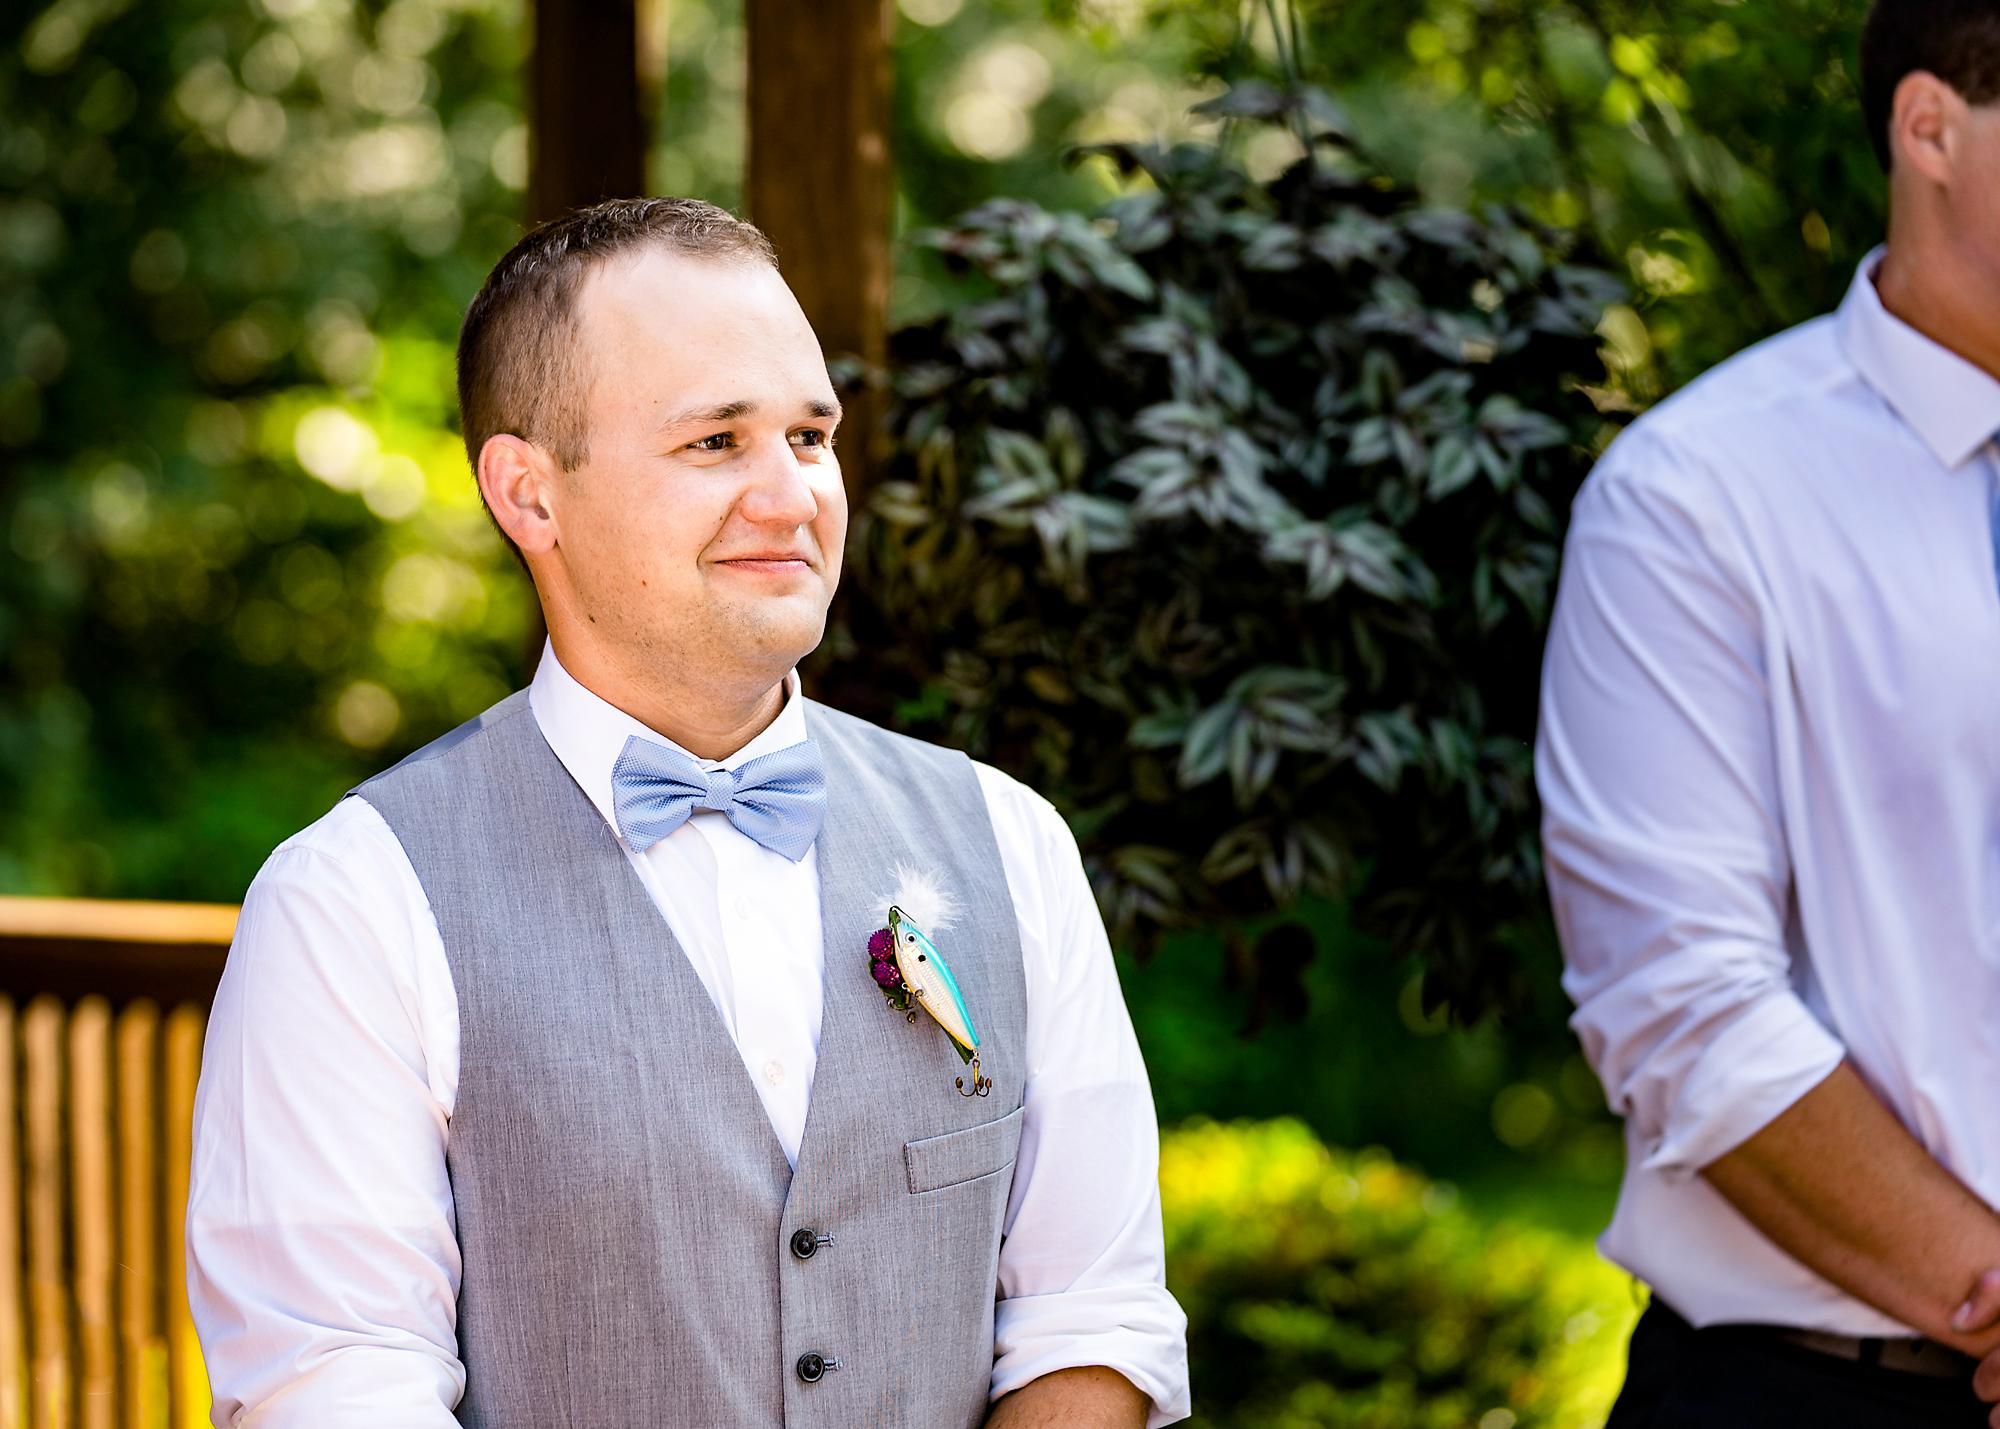 Pattison-Park-Lodge-Wedding-Cincinnati-Ohio-Photographer-18.jpg